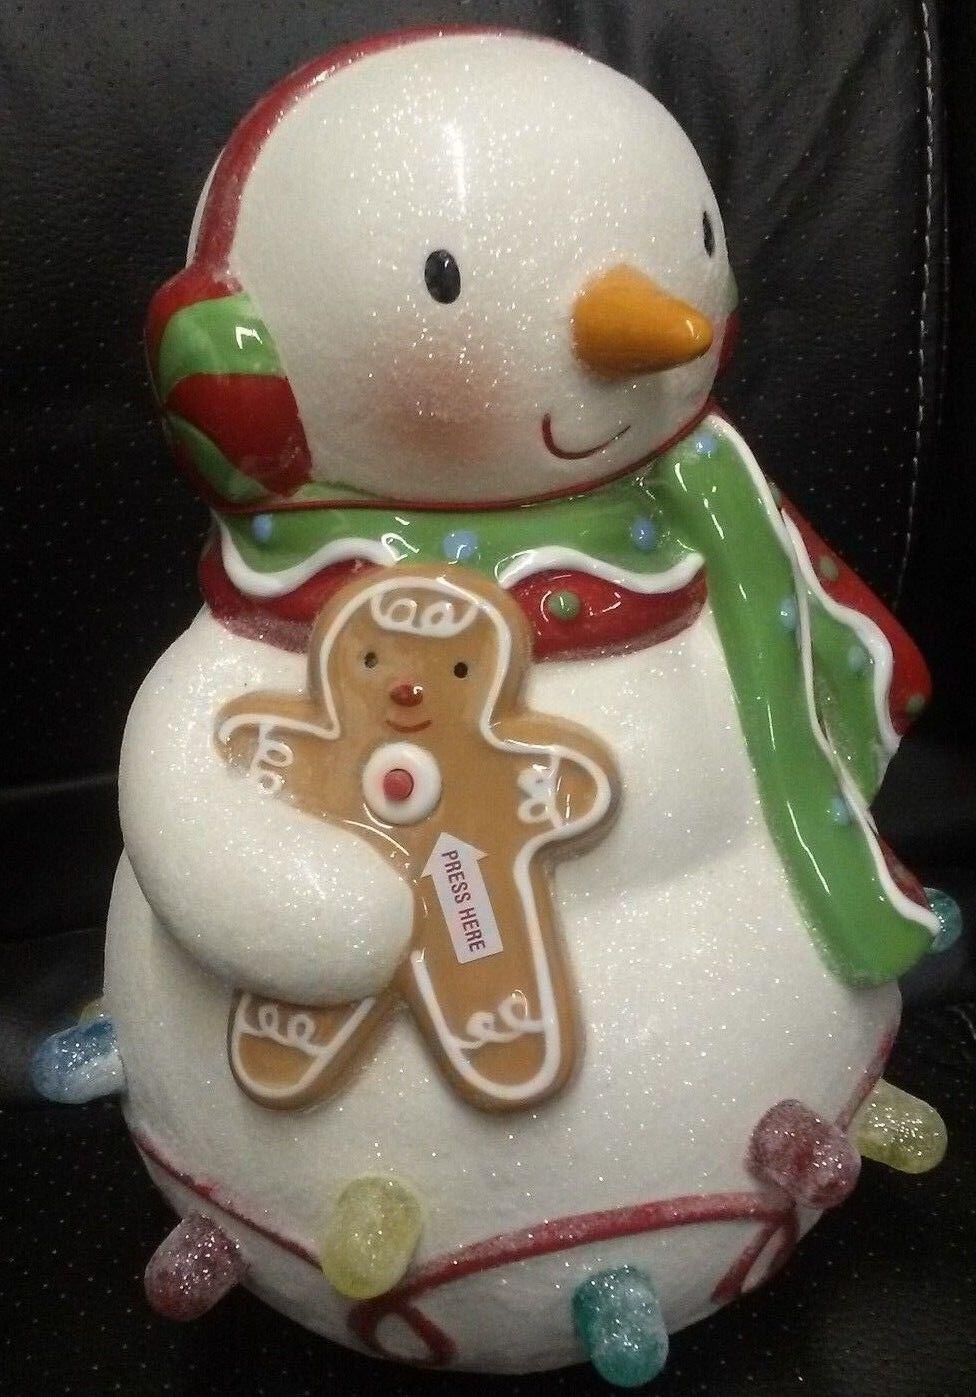 2010 Hallmark Keepsake Ornament Season/'s Treatings #2 in Series New